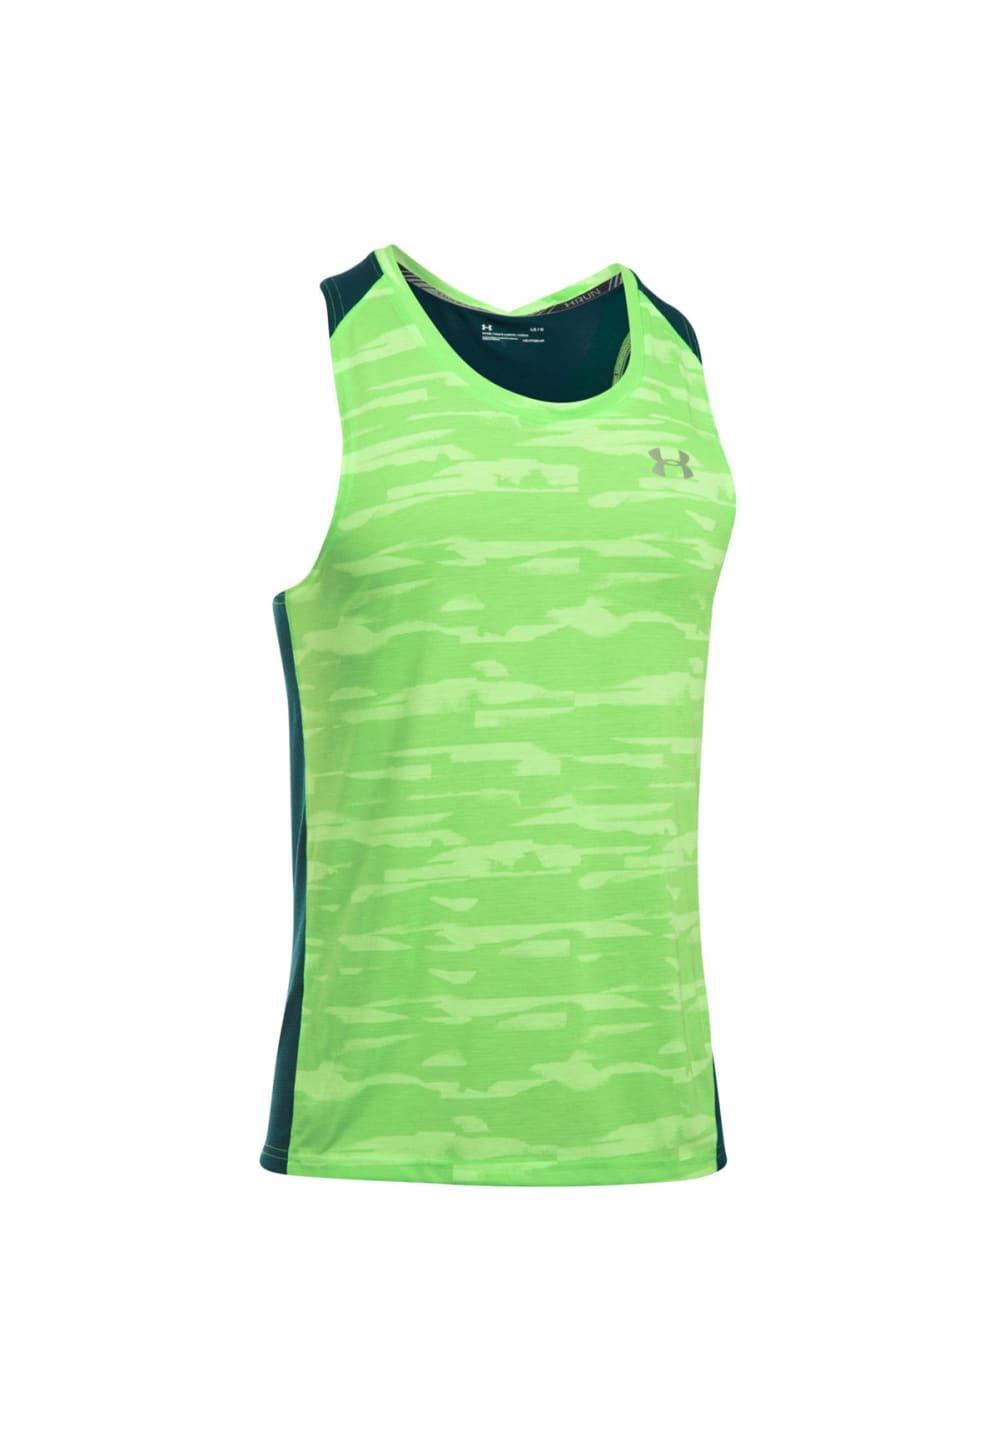 952ce928 Under Armour Threadborne Run Mesh Singlet - Running tops for Men - Green